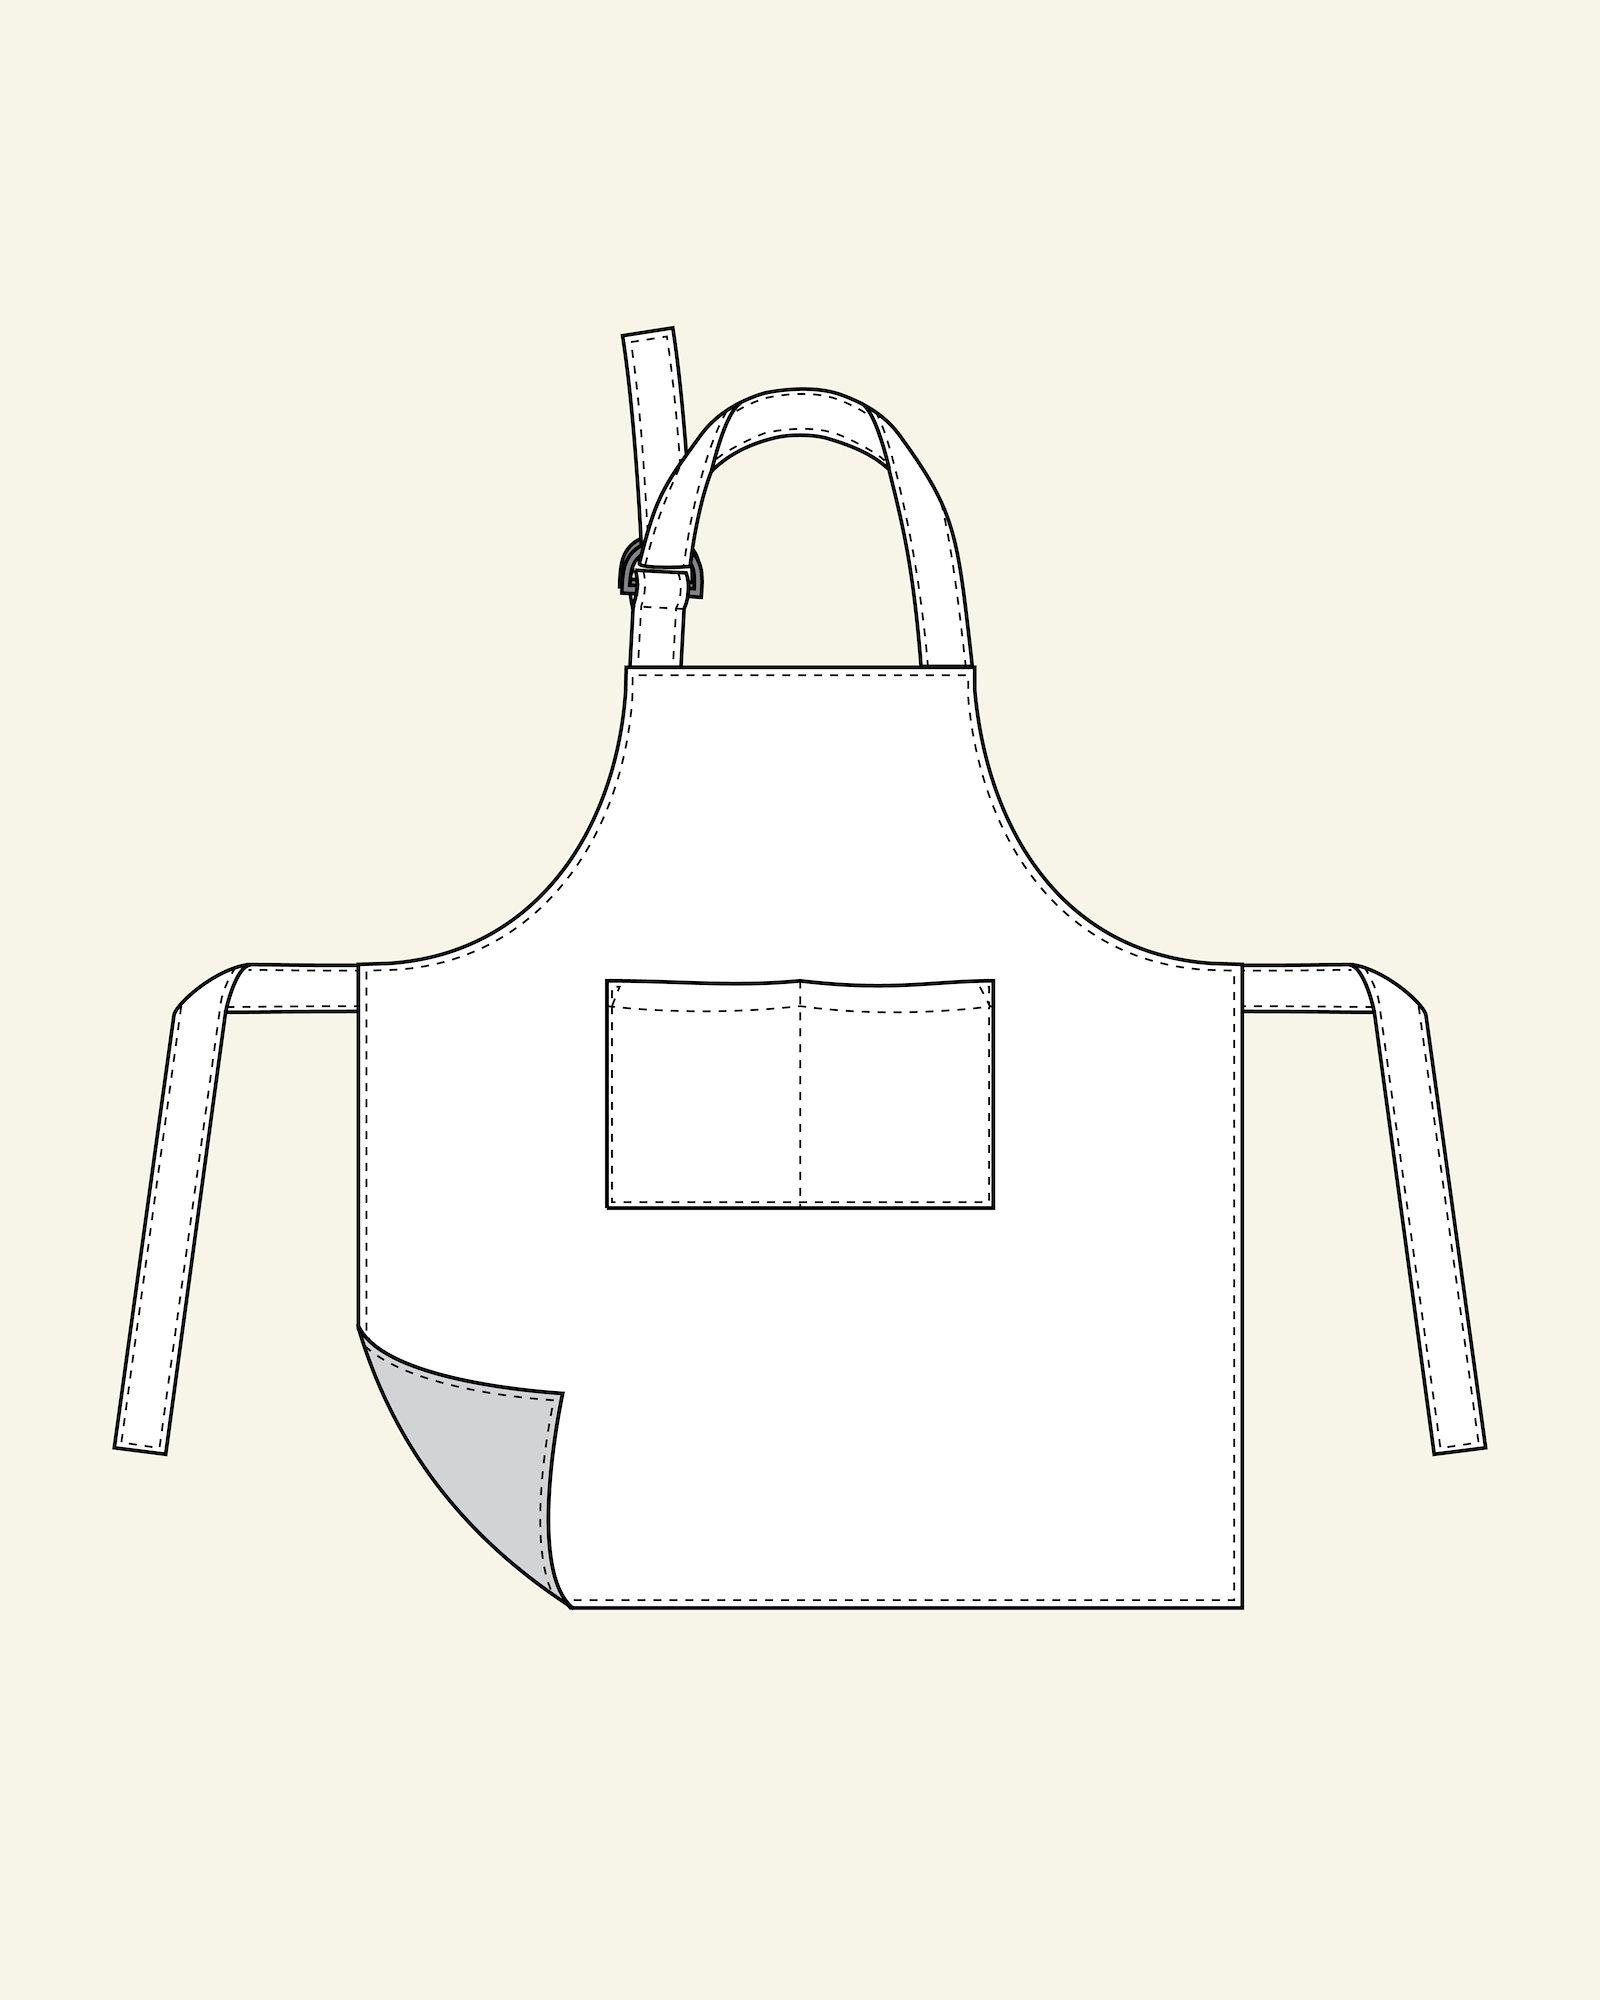 Childs apron